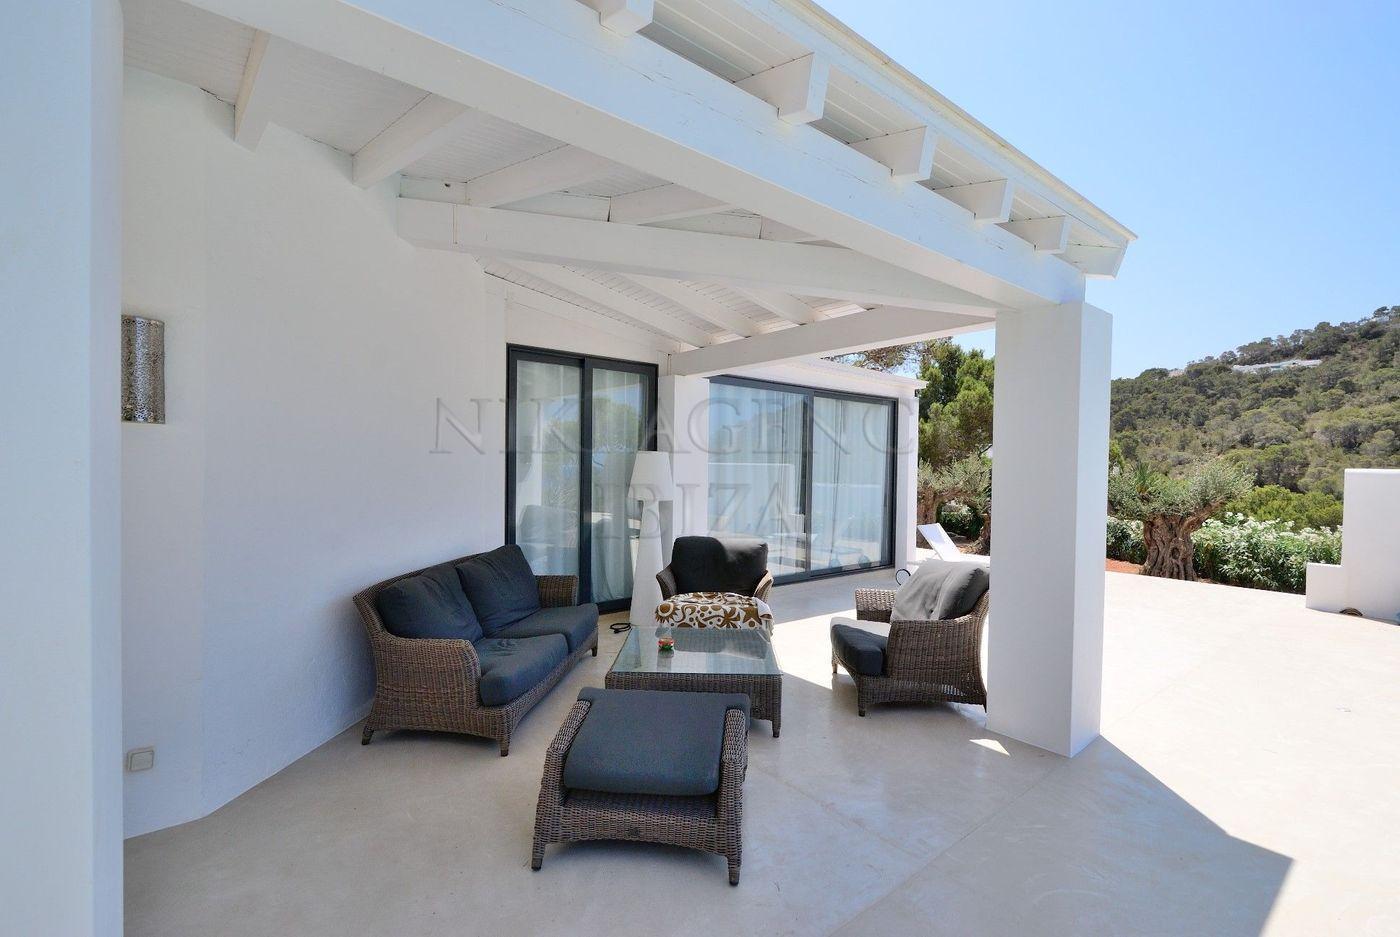 6. House for sale in Sant Josep de sa Talaia Ibiza - Fantastic 4 Bed Villa For Sale in Sant Josep de sa Talaia, Ibiza!